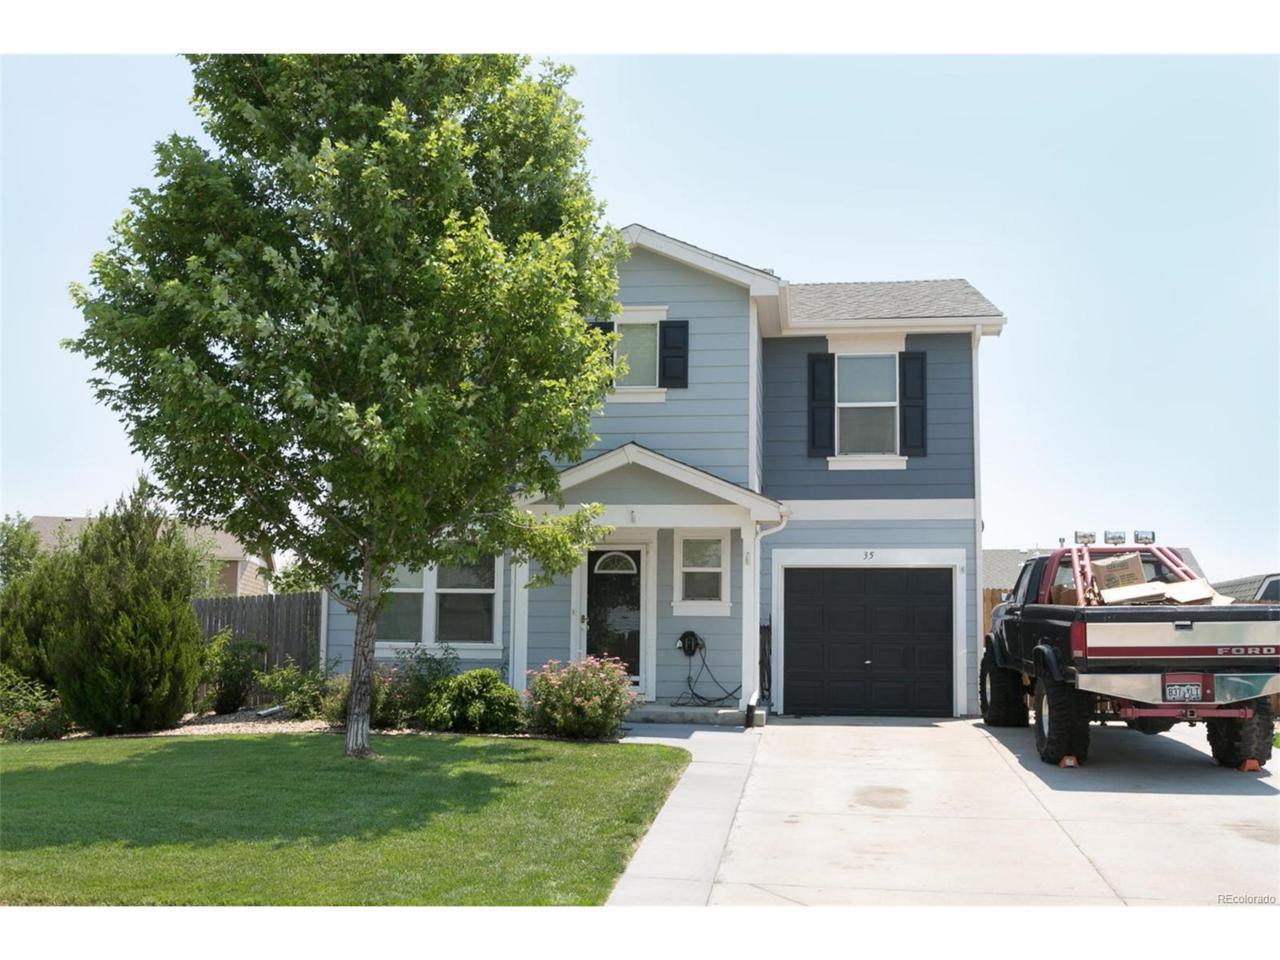 35 Shenandoah Way, Lochbuie, CO 80603 (MLS #8486484) :: 8z Real Estate